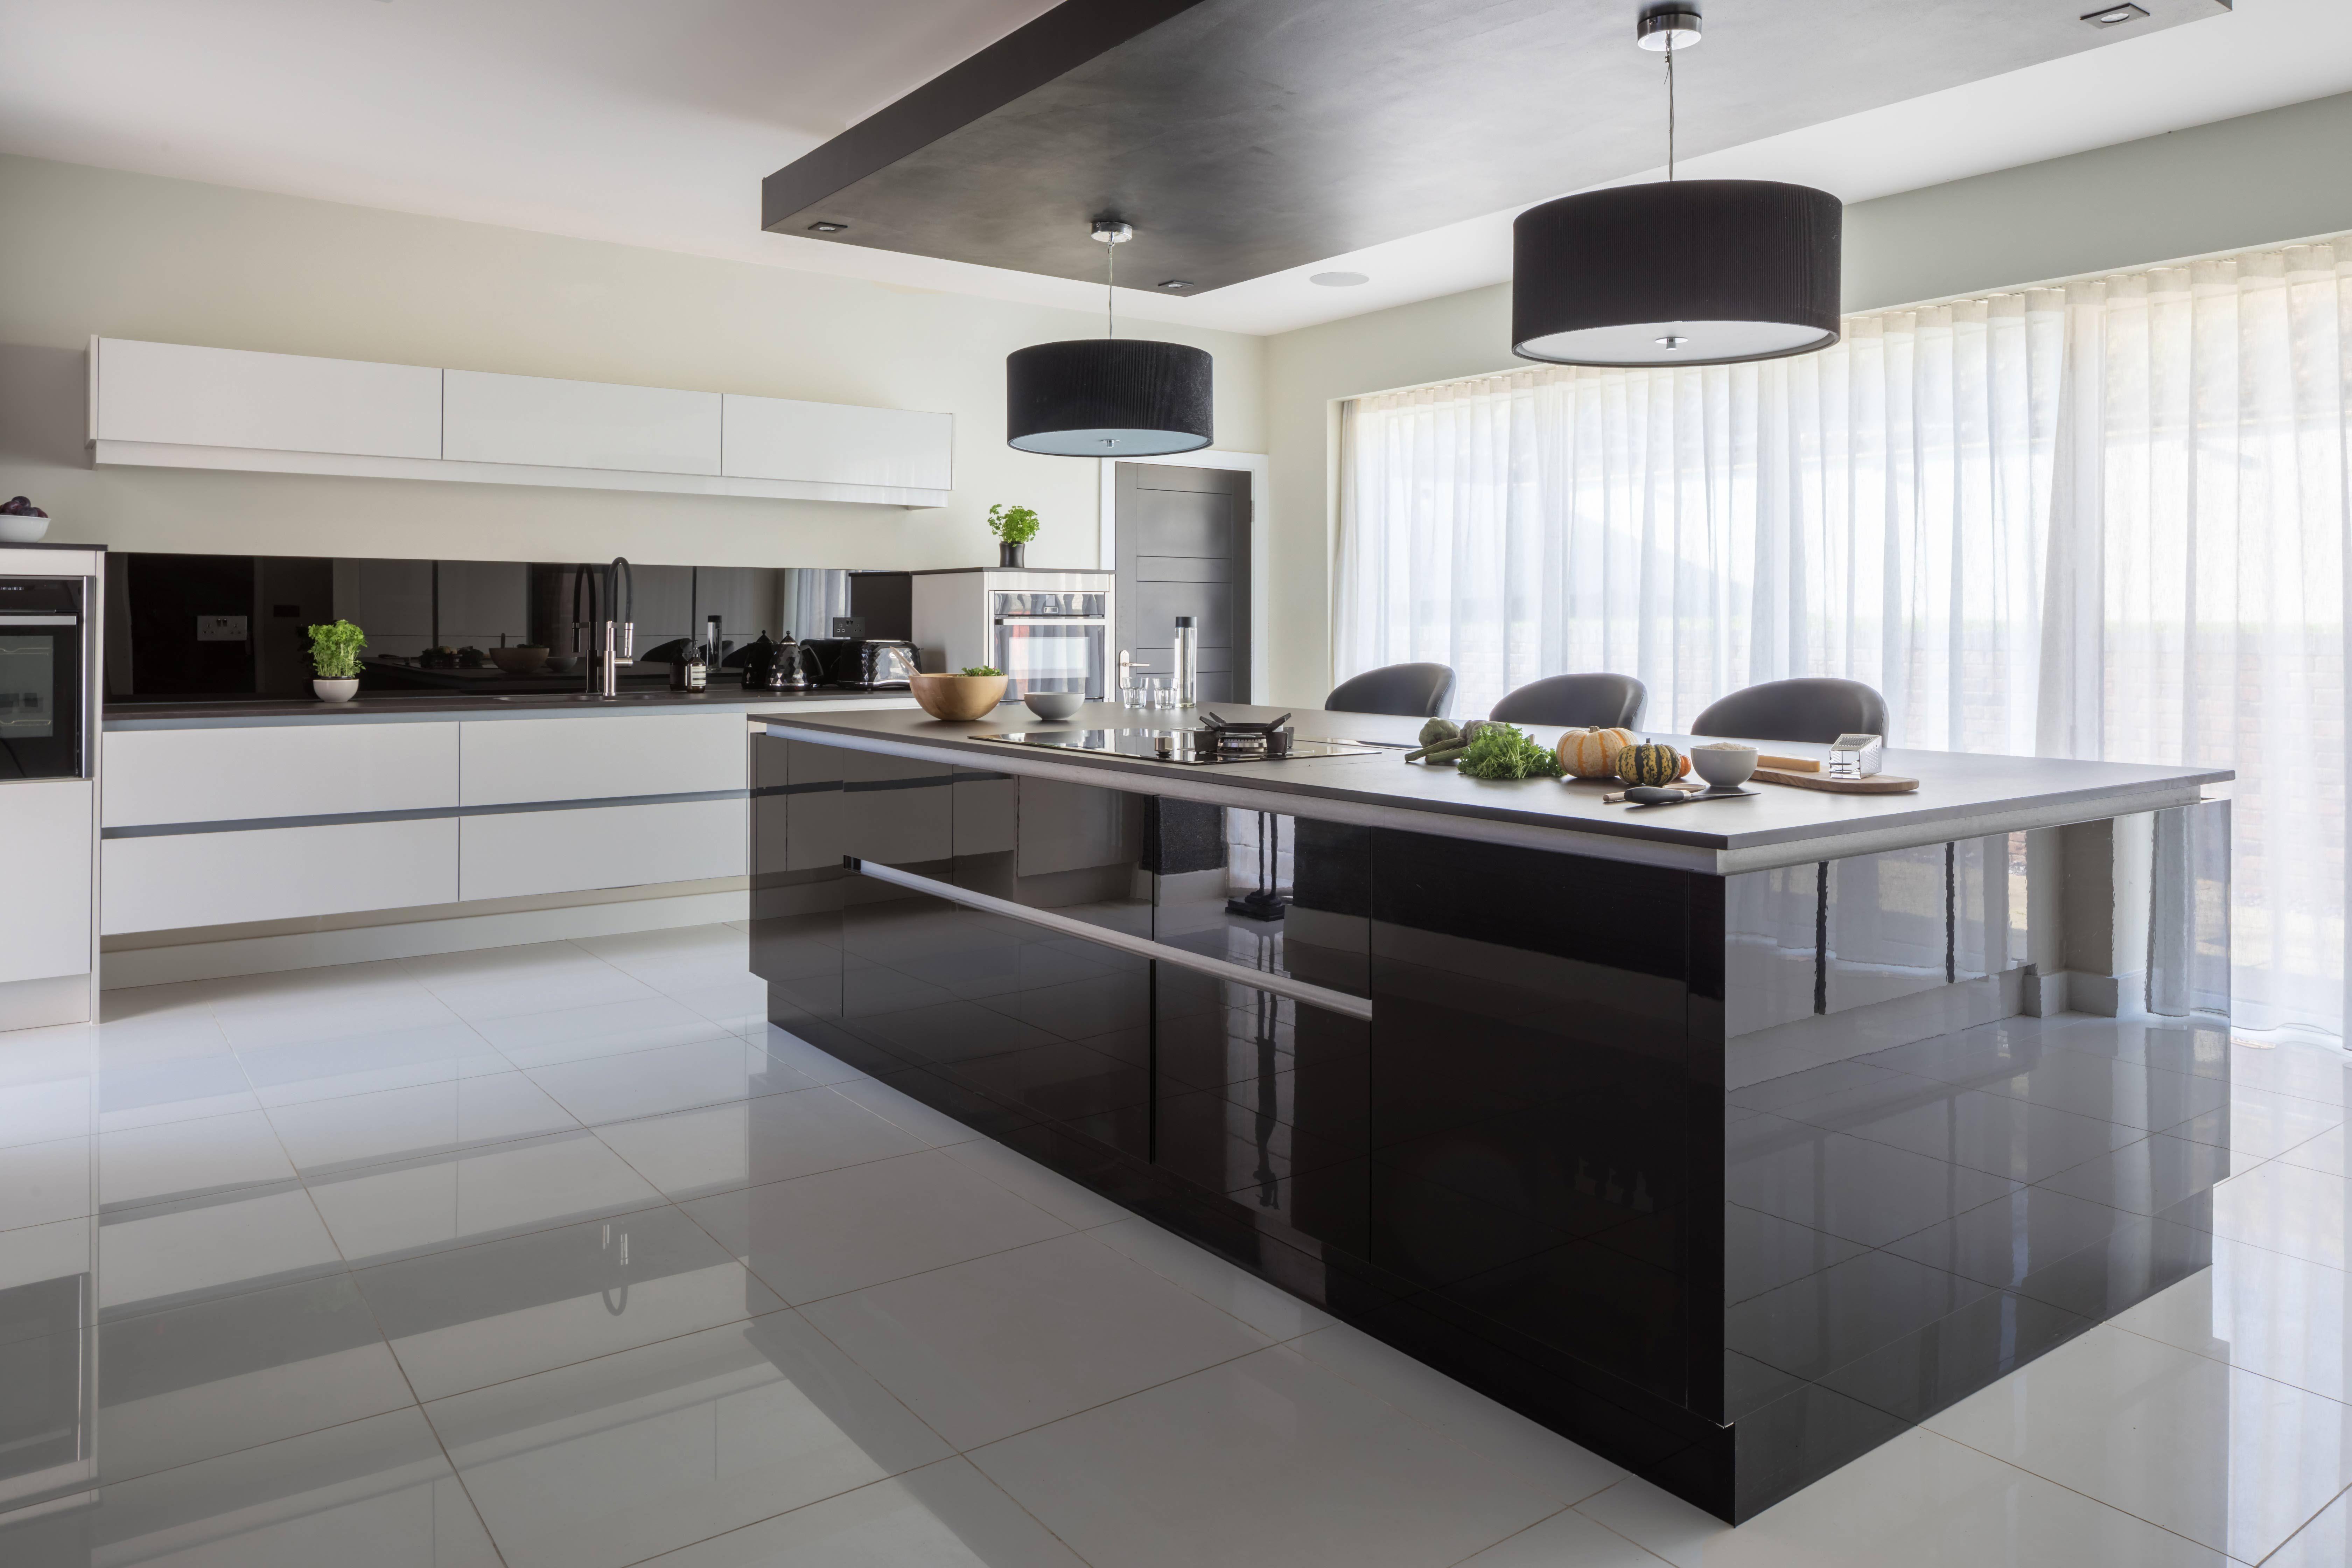 This Is Modern Sleek Kitchen Design The Mixture Of White Black And Dark Grey In A Gloss Finish Adds Sleek Kitchen Design Modern Kitchen Design Sleek Kitchen